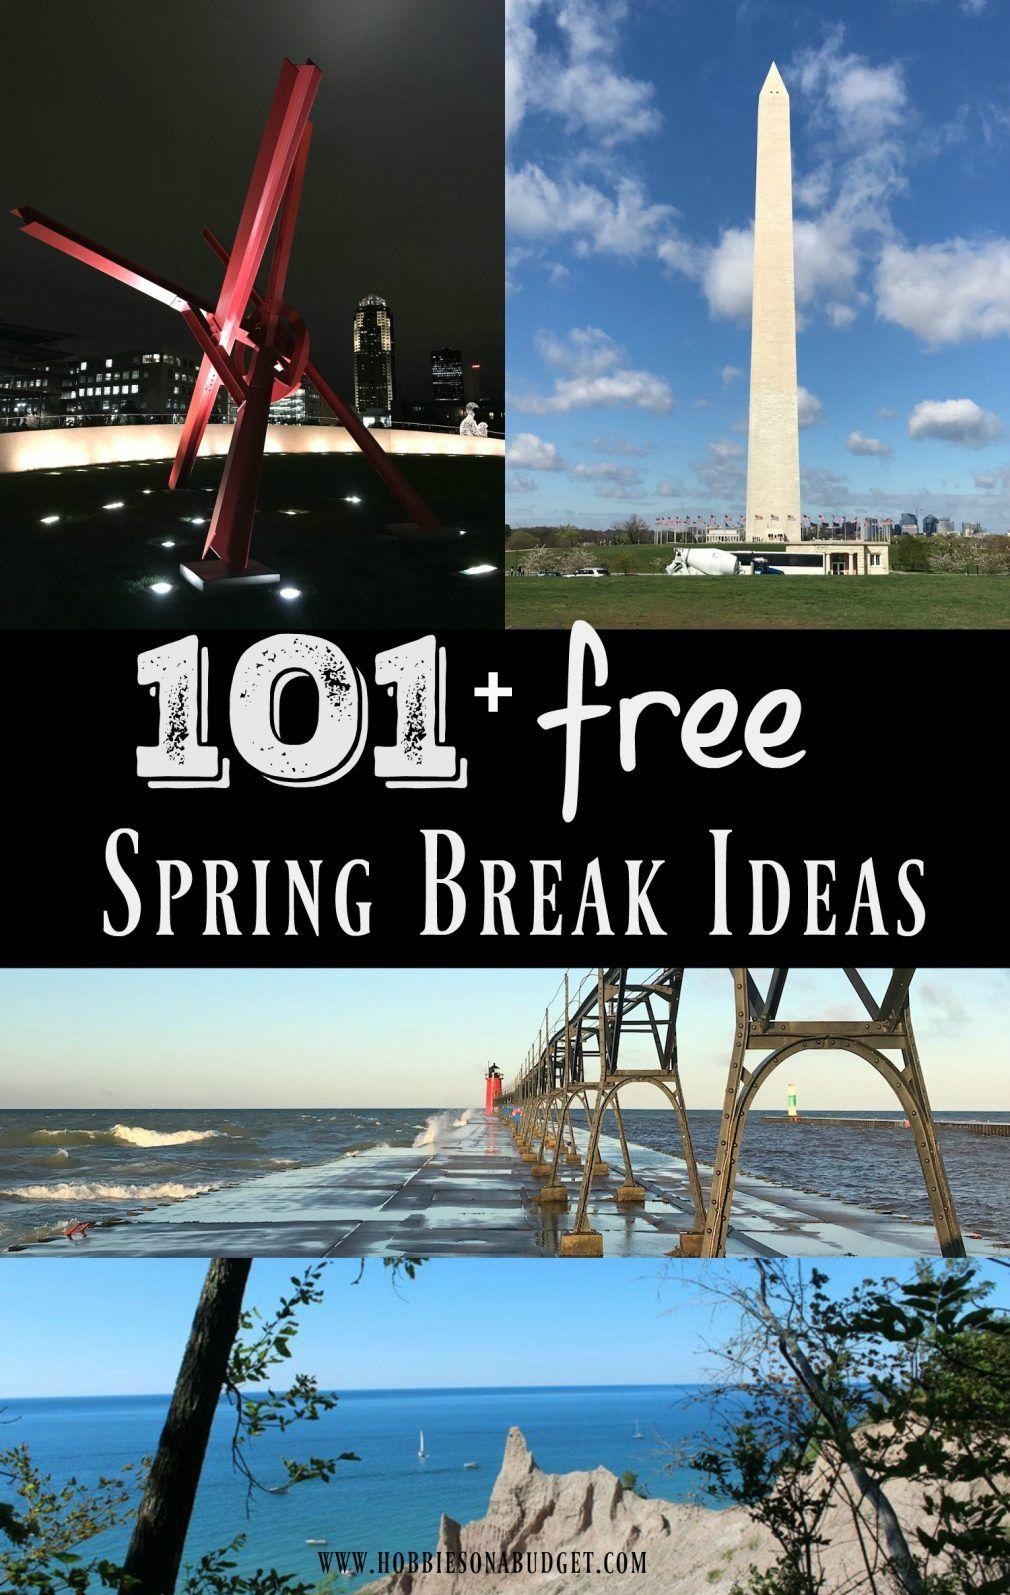 Spring Break 2019 Travel Ideas 101+ FREE Spring Break Ideas for 2019   Budget Travel   Us road